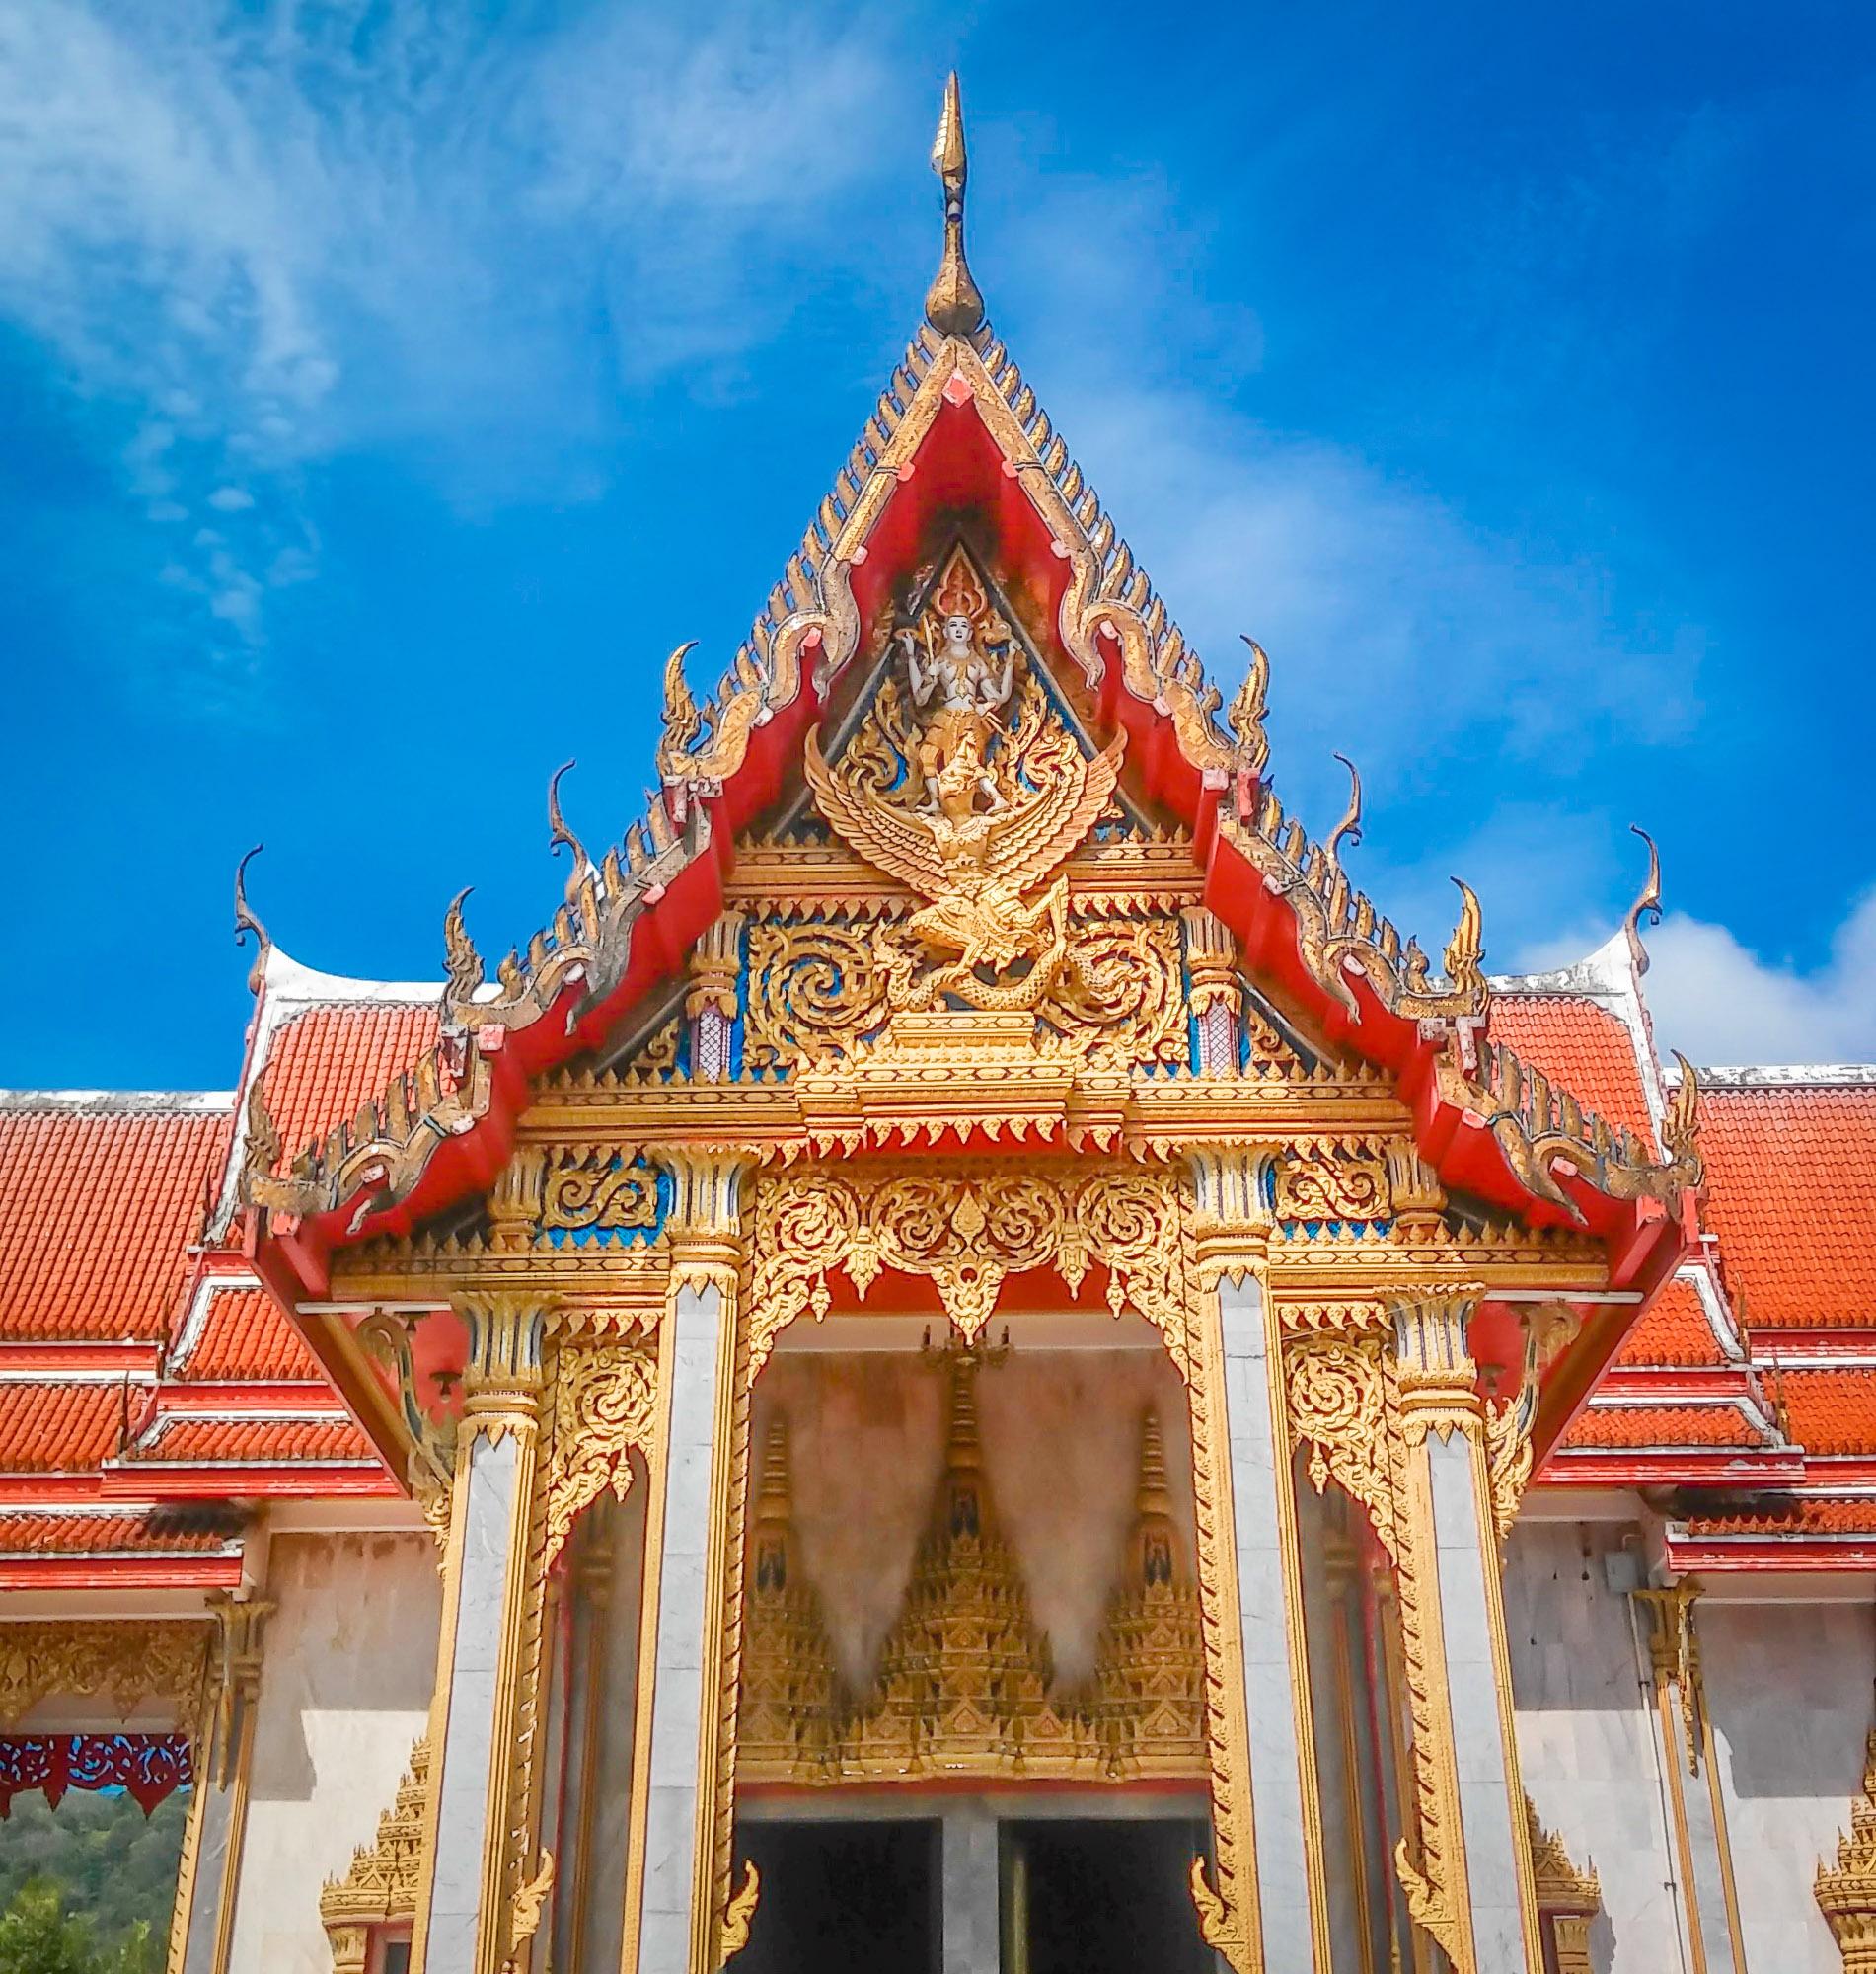 Temple pic.jpg